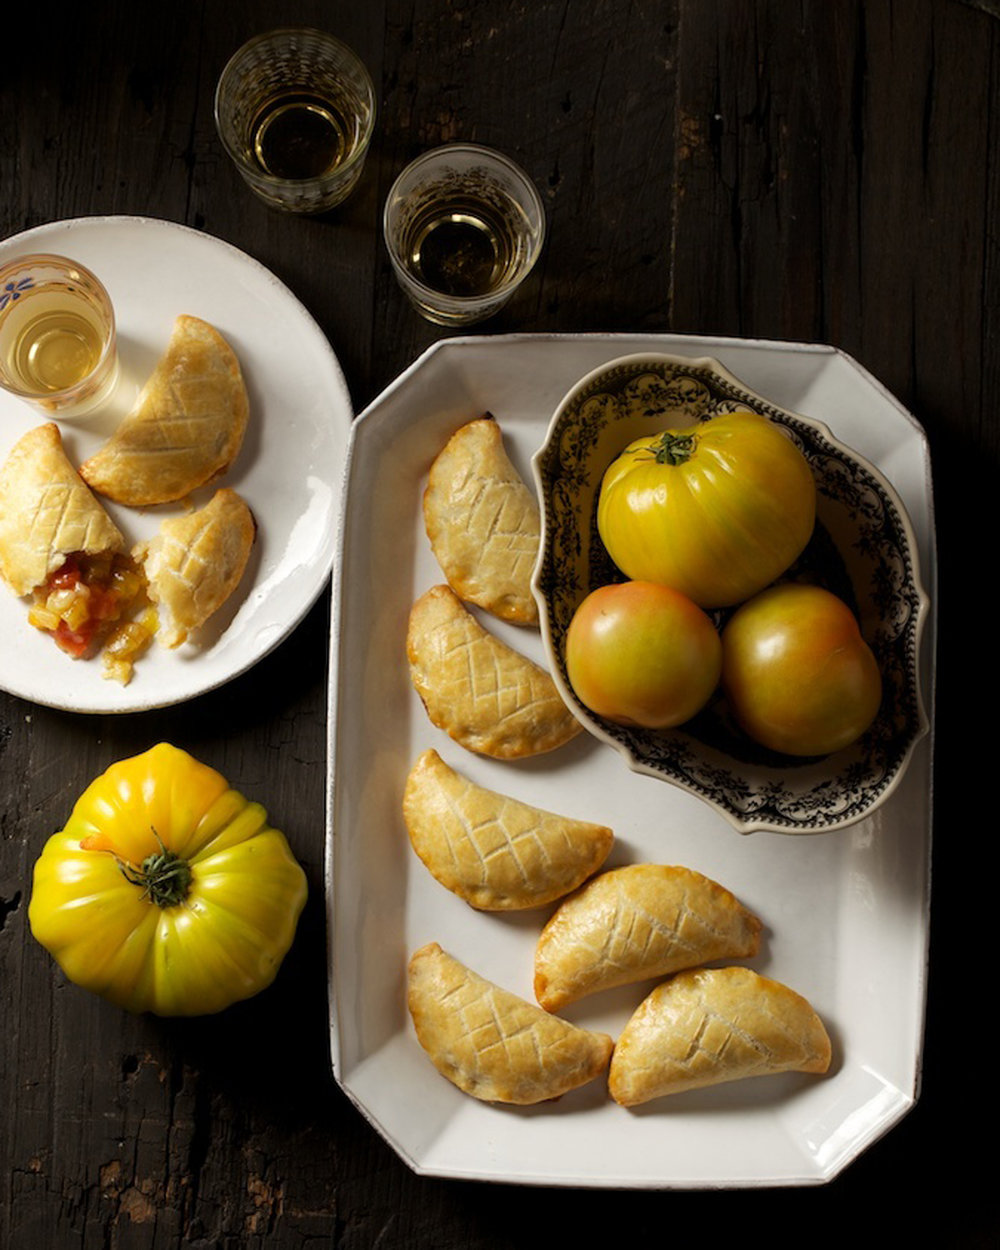 Paulette+Tavormina+Beekman+Dessert+Green+Tomatoes.jpeg